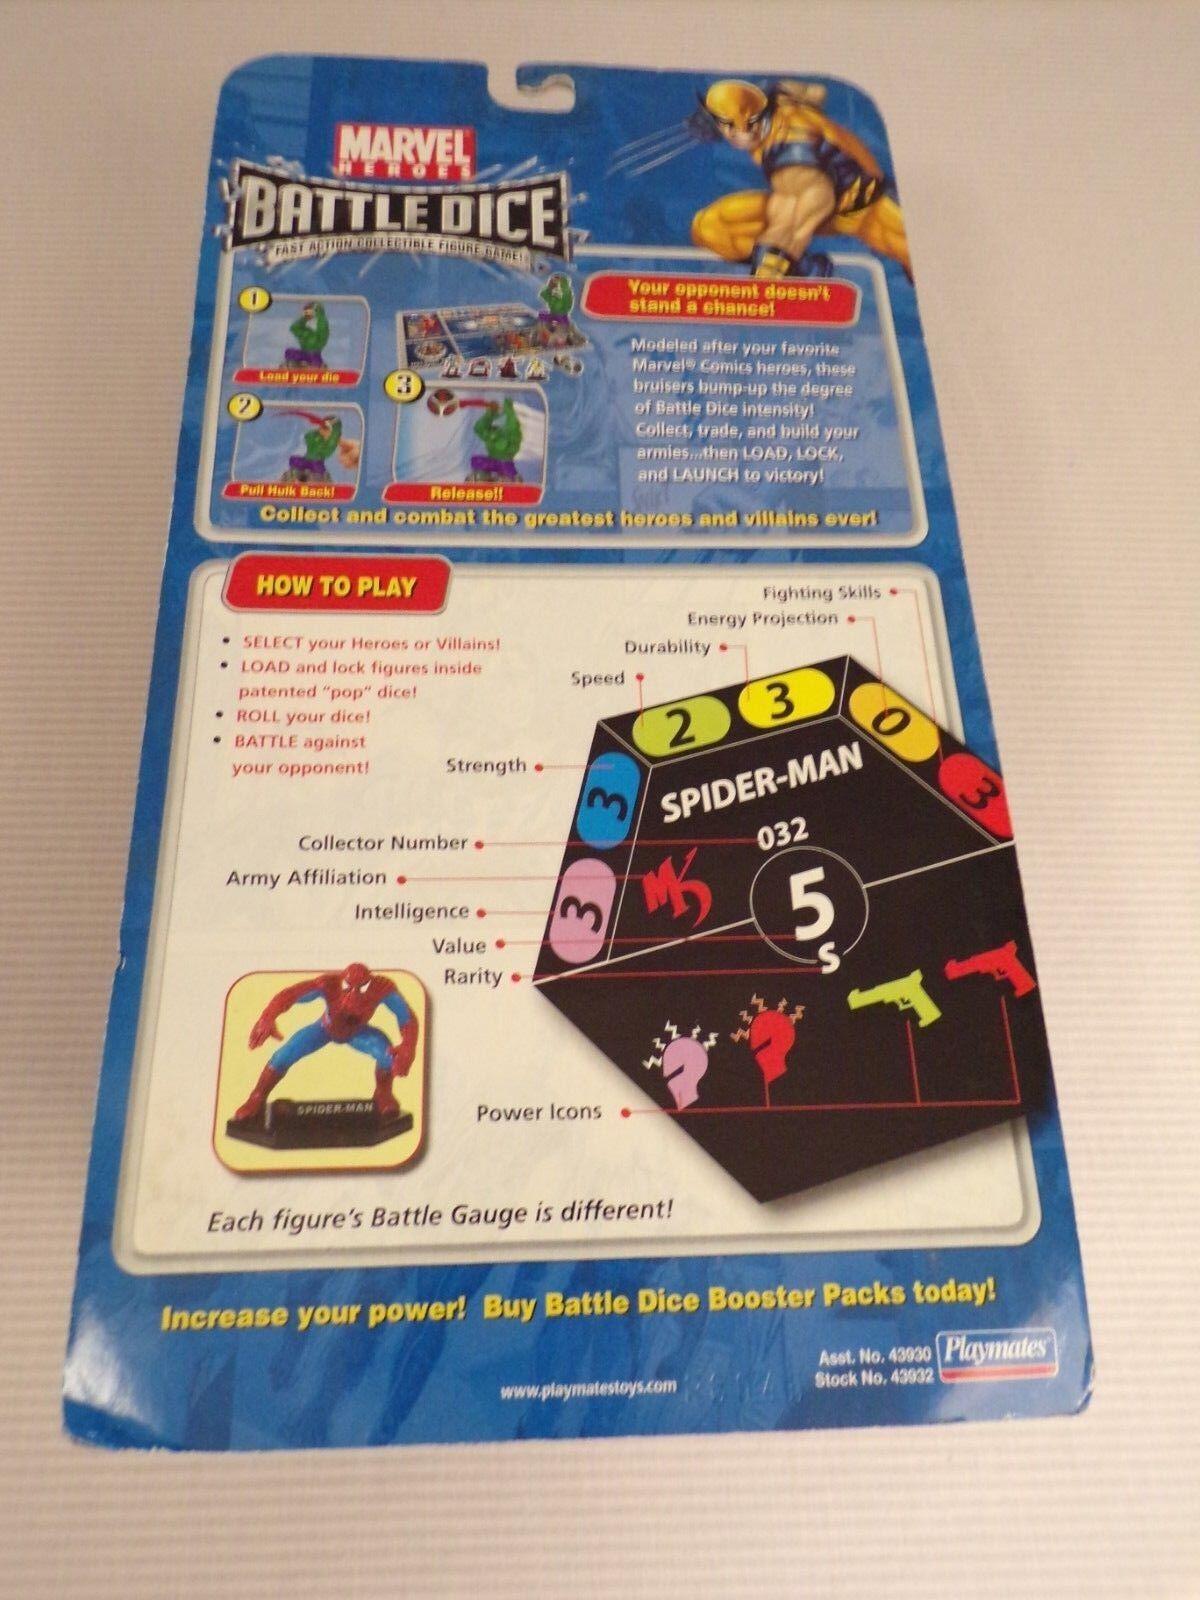 MARVEL MARVEL MARVEL HULK BATTLE Dice Launcher Playmates 9a7341